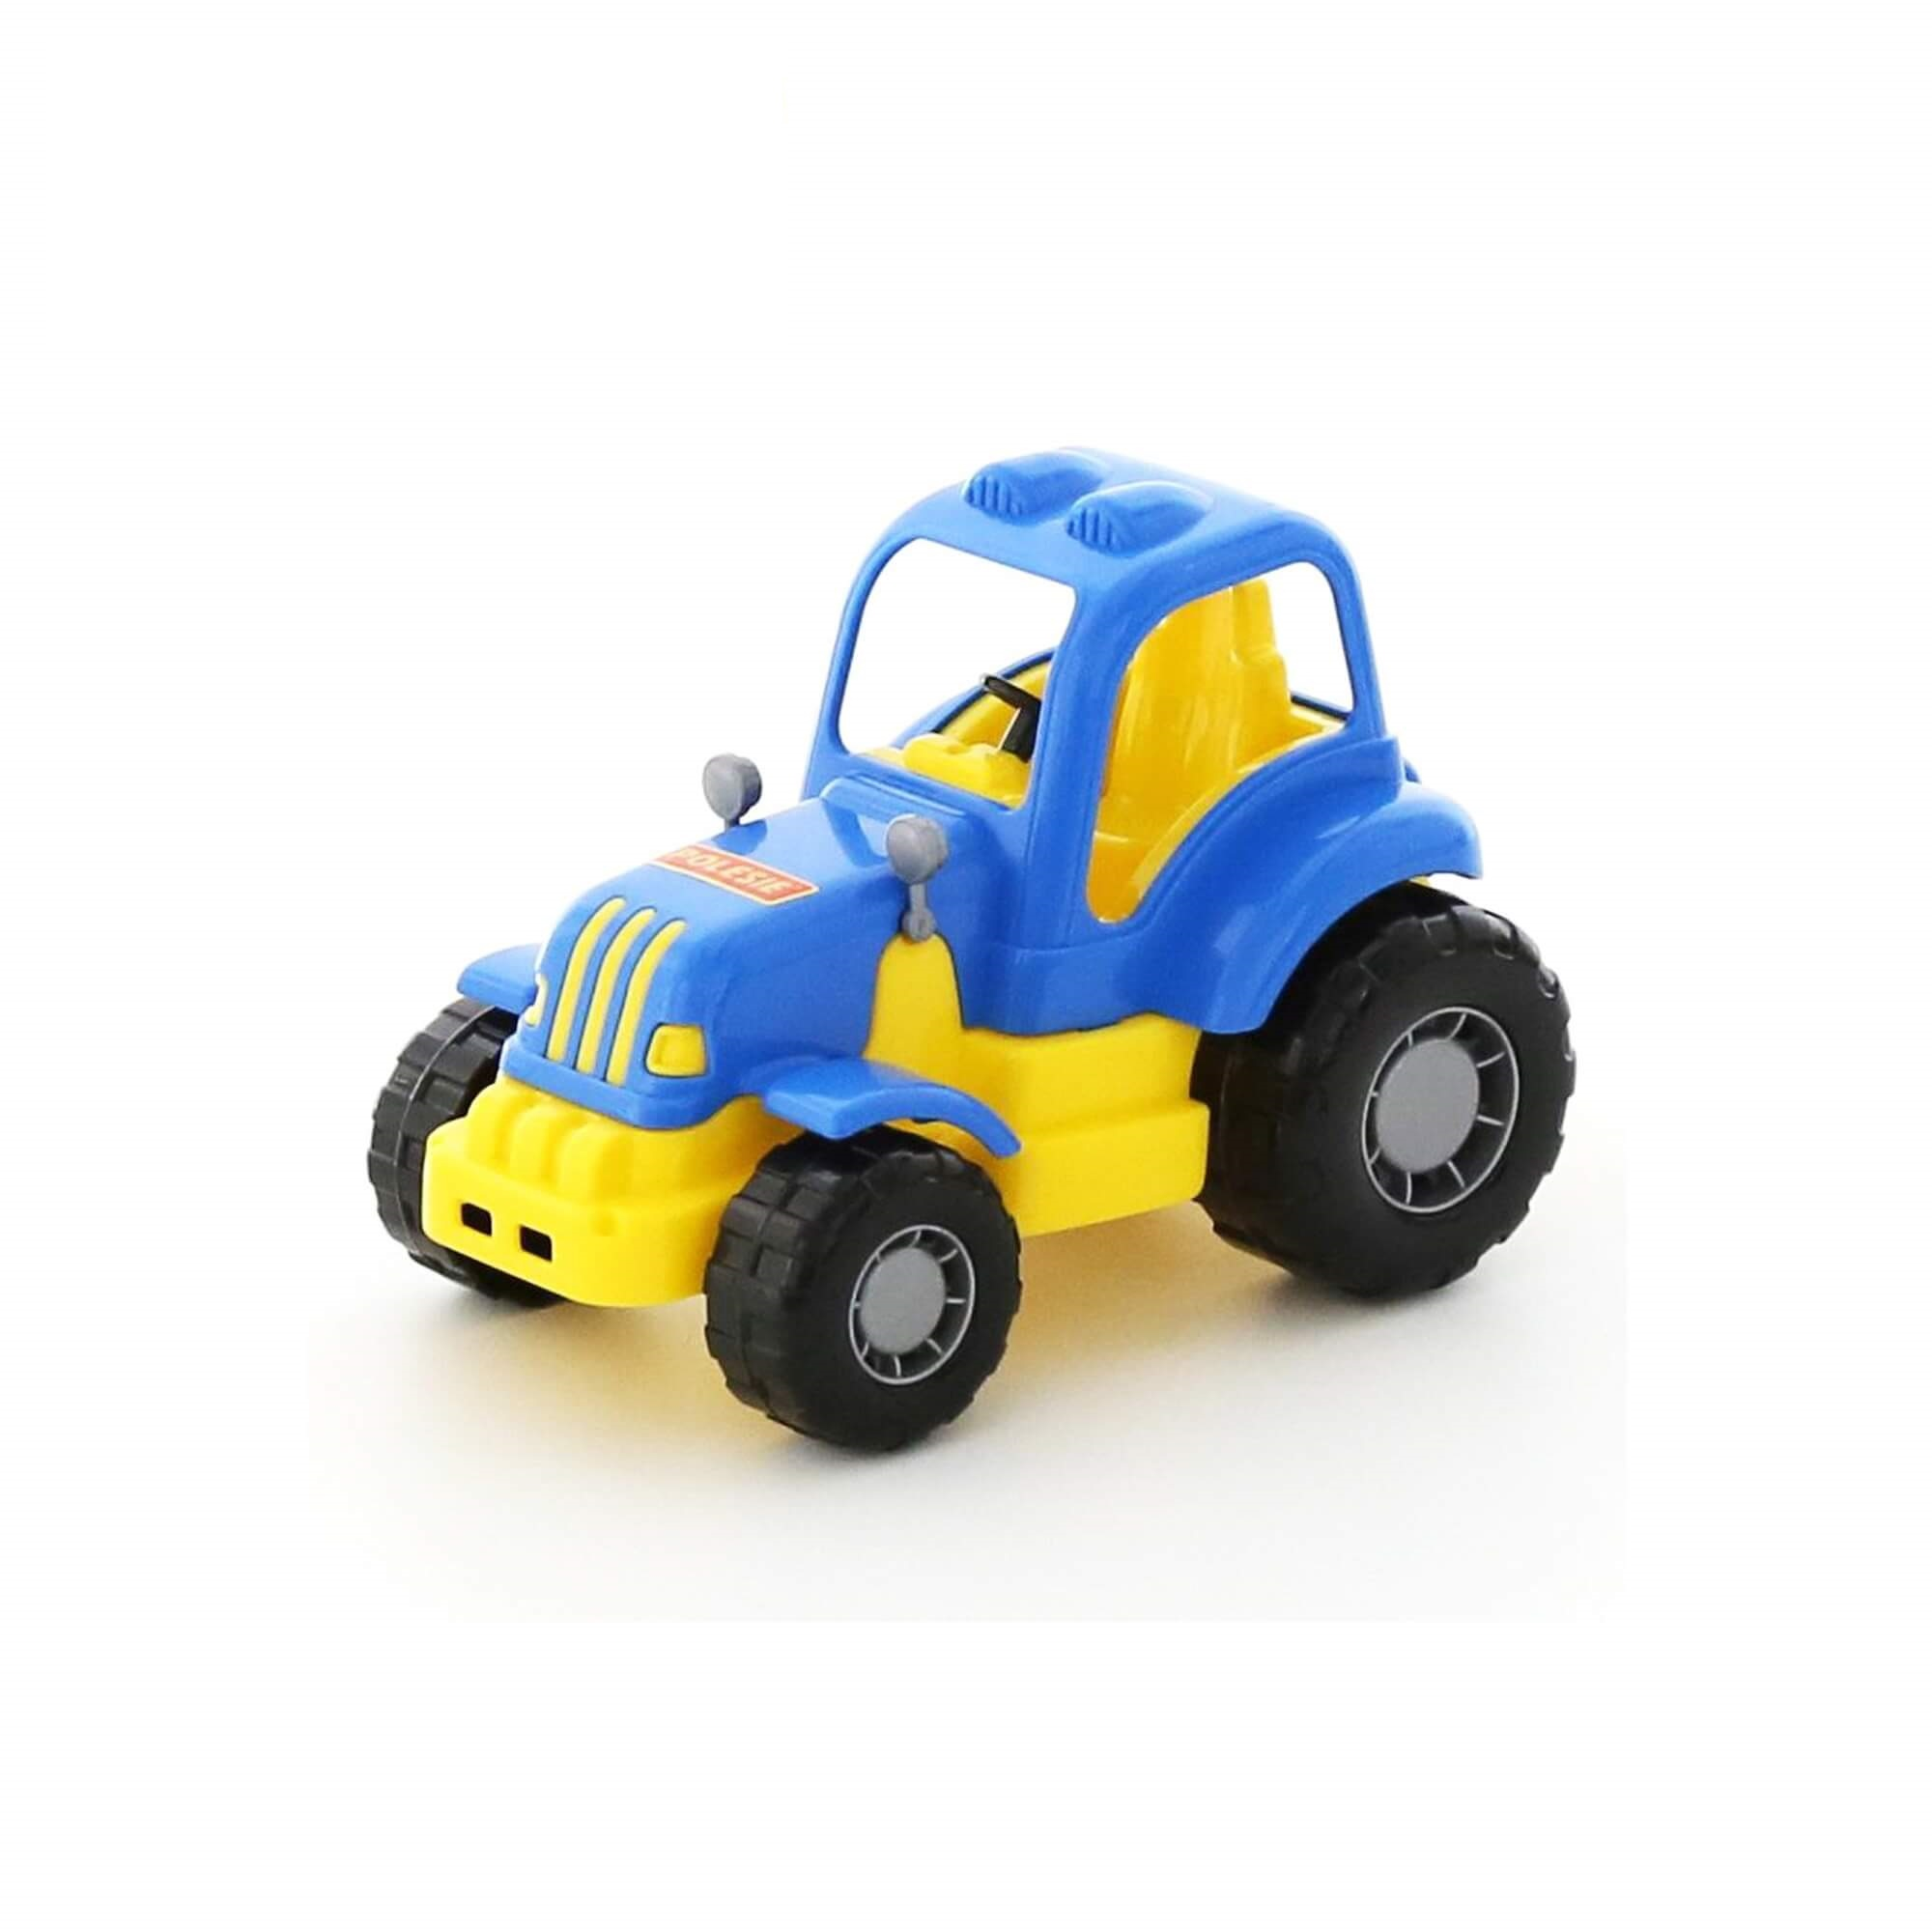 máy kéo đồ chơi Hardy Polesie toys